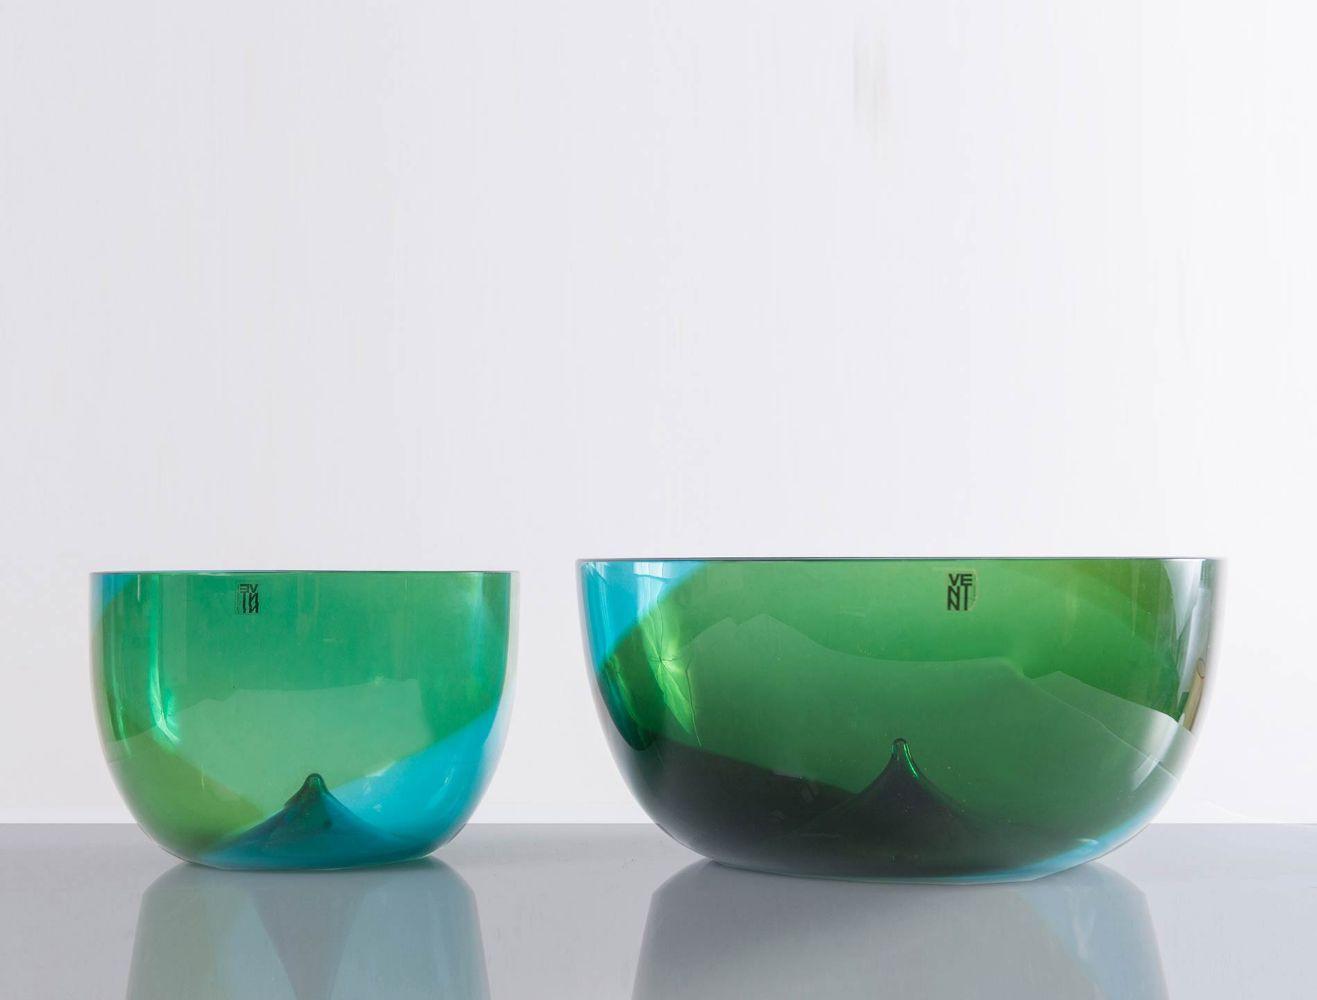 Auction 42 - 20th Century Design and Decorative Arts